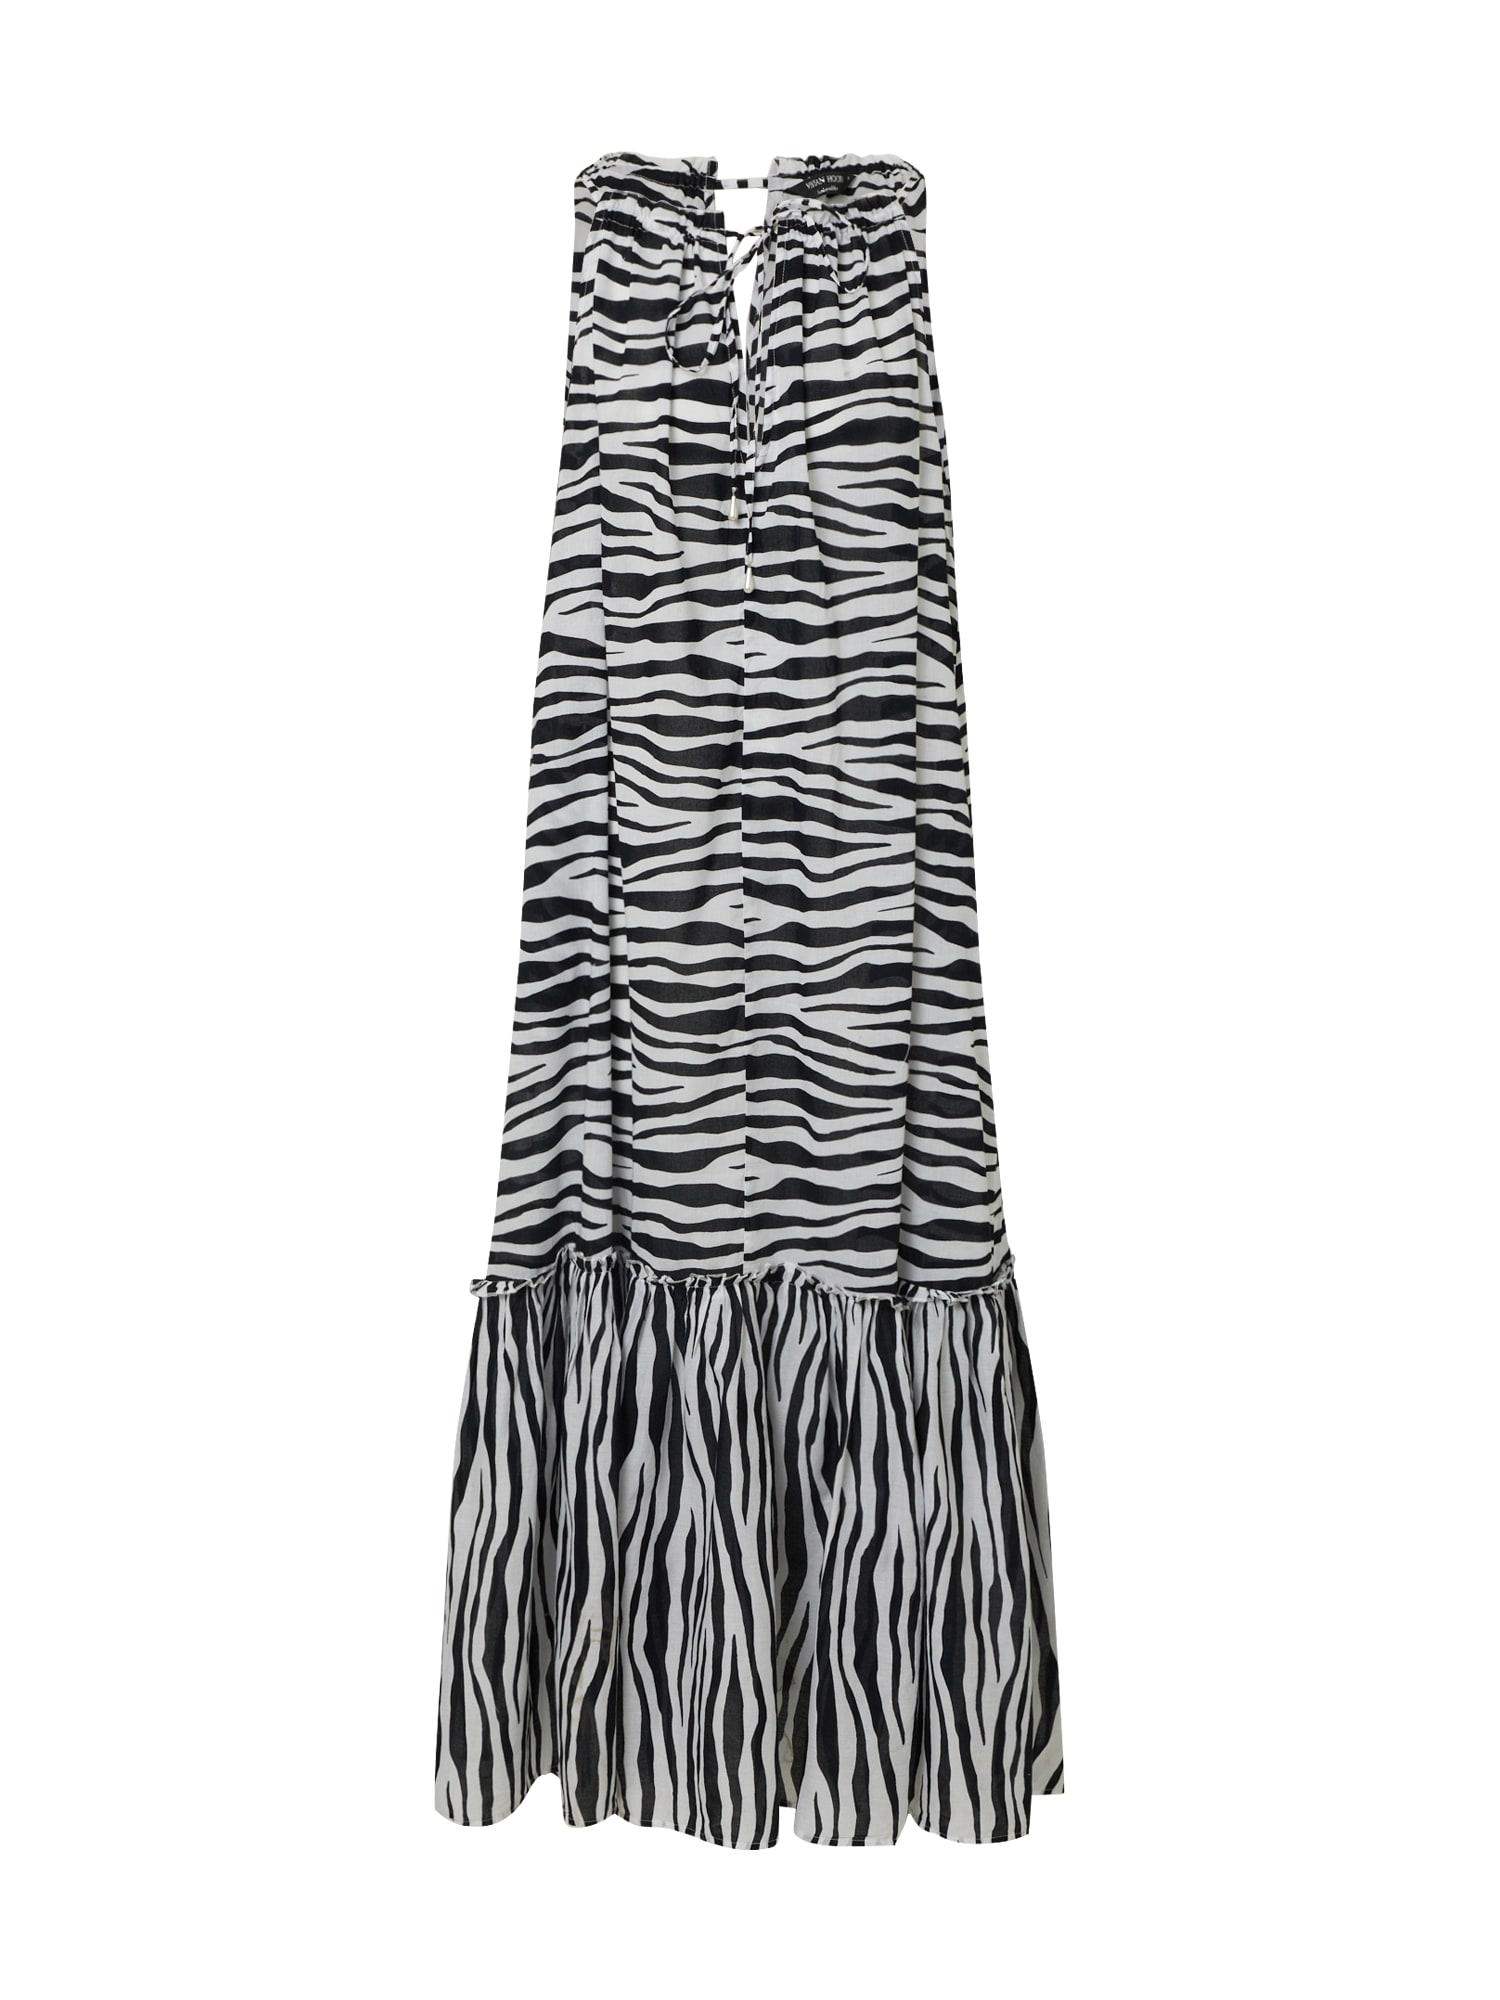 Hunkemöller Plážové šaty 'Amalfi'  čierna